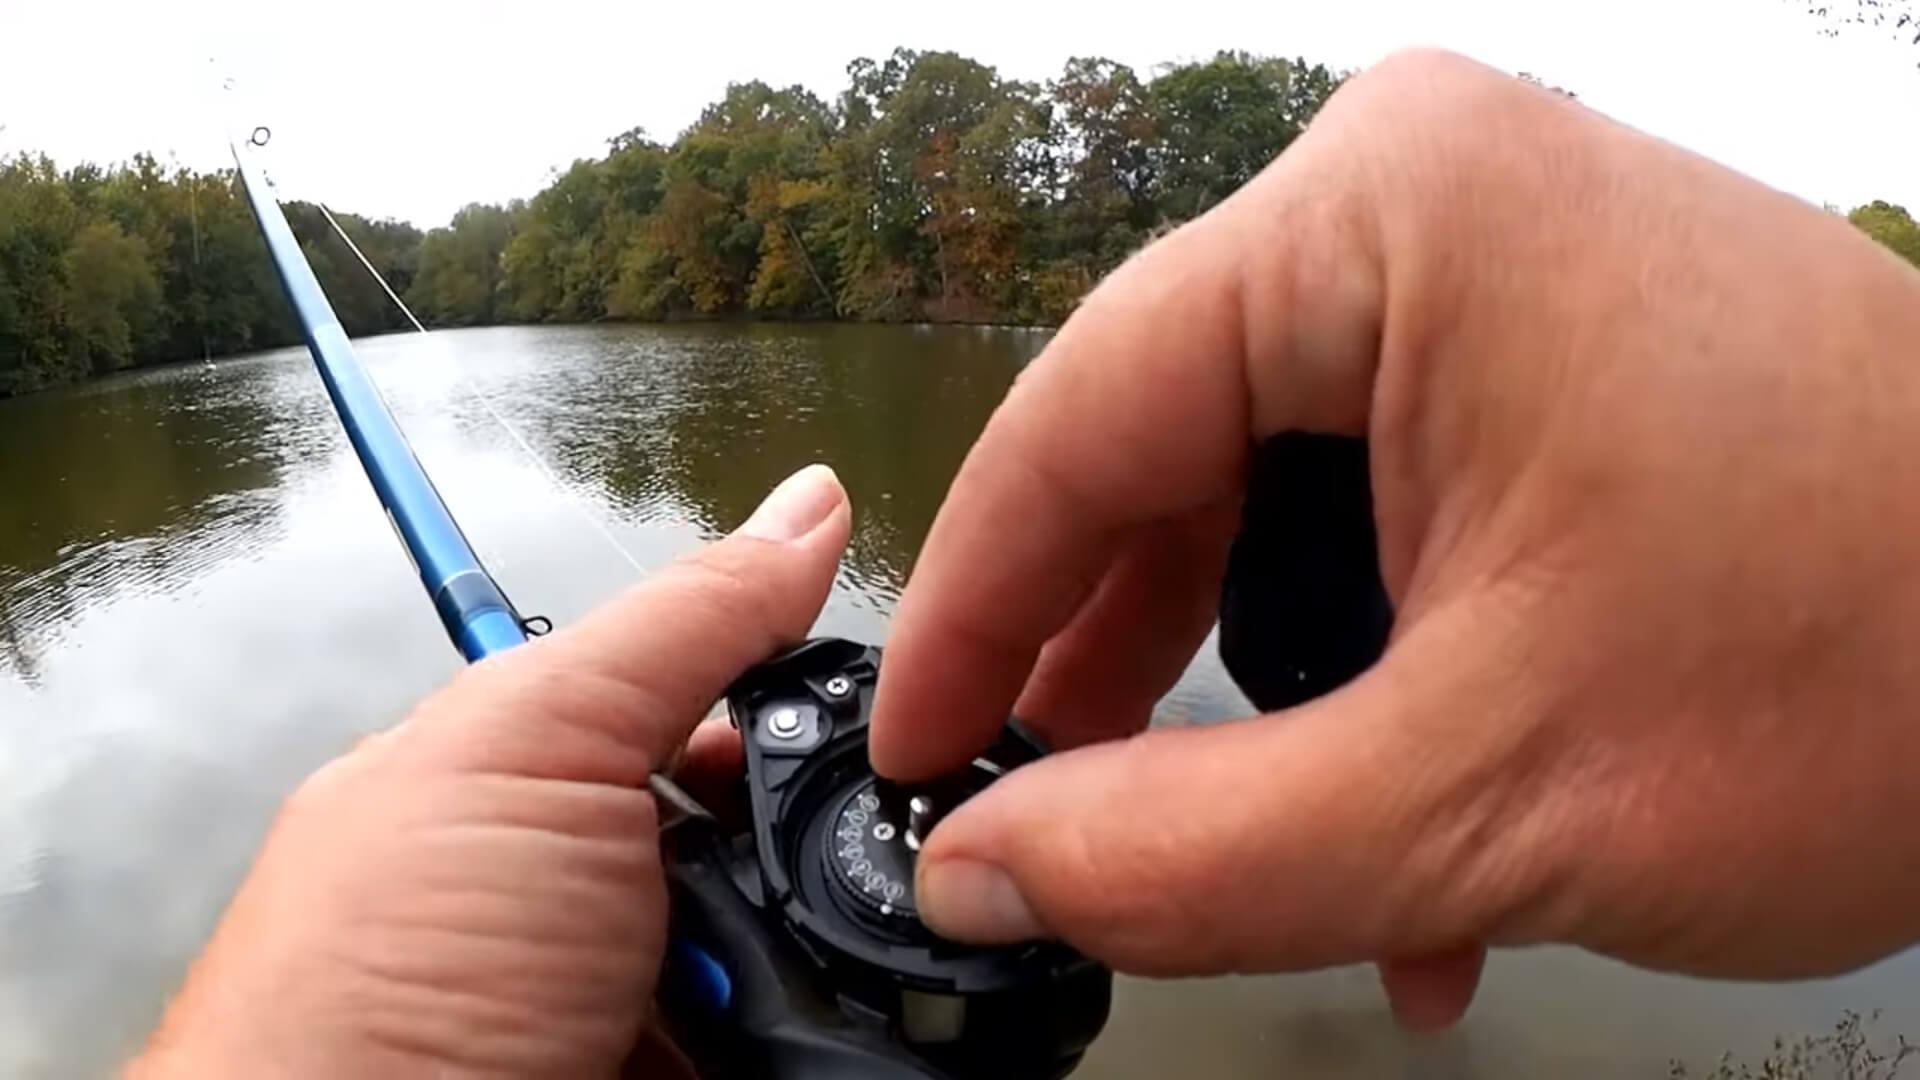 Easy Baitcaster Tips for Beginners how do brakes effect casting - Realistic Fishing